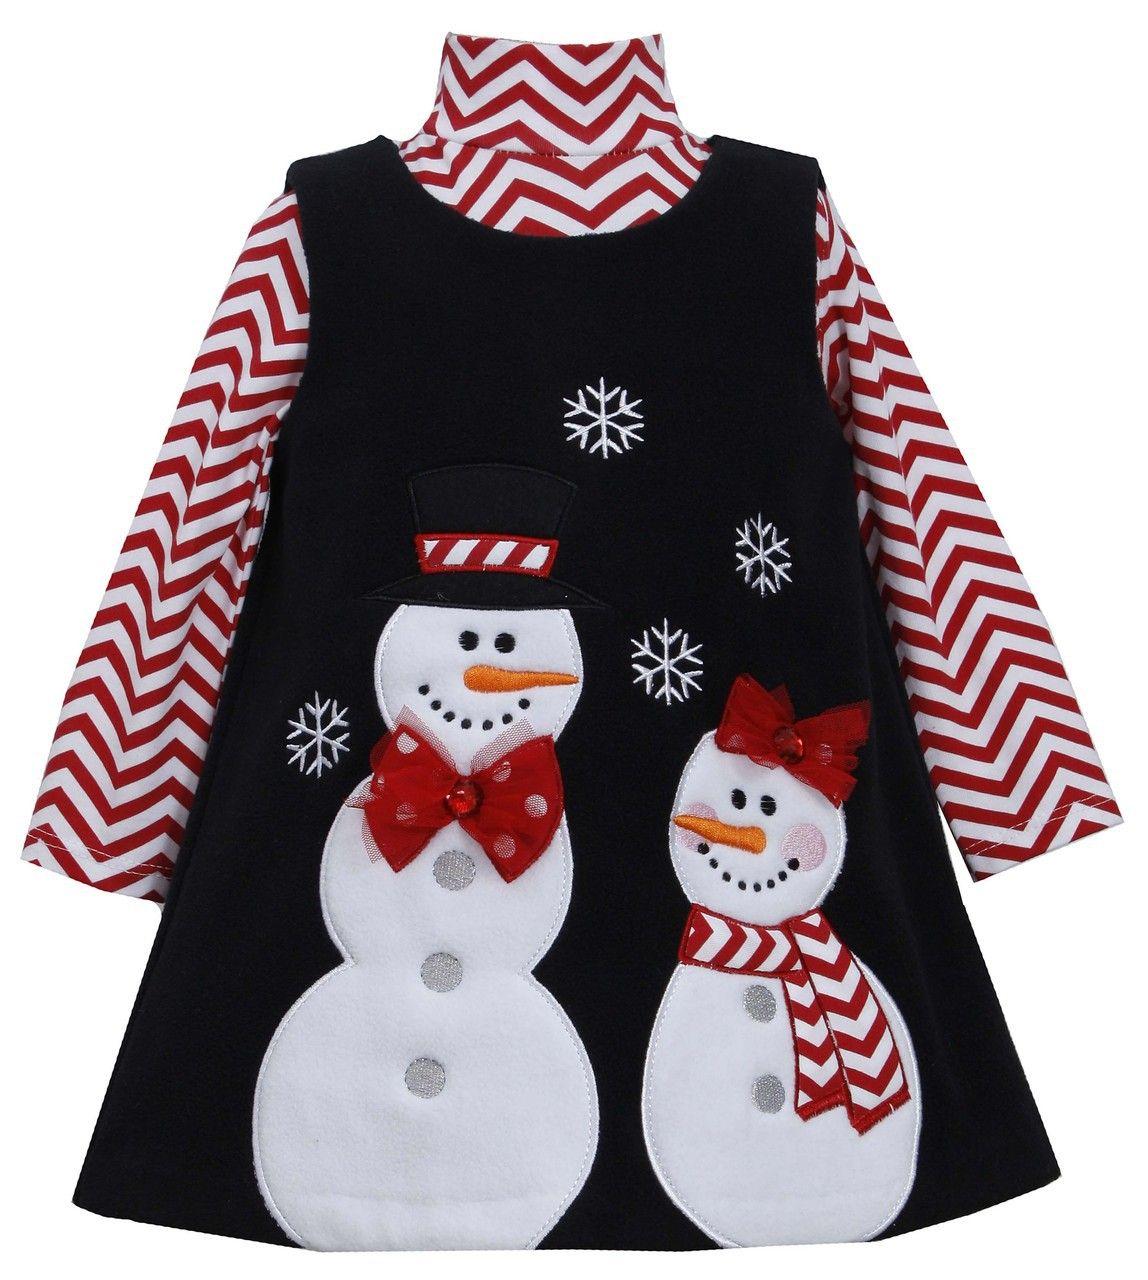 7f8e5cb919ef Ella Blu Store - Bonnie Jean Christmas Holiday Snowman Jumper Set 4-6X,  $25.00